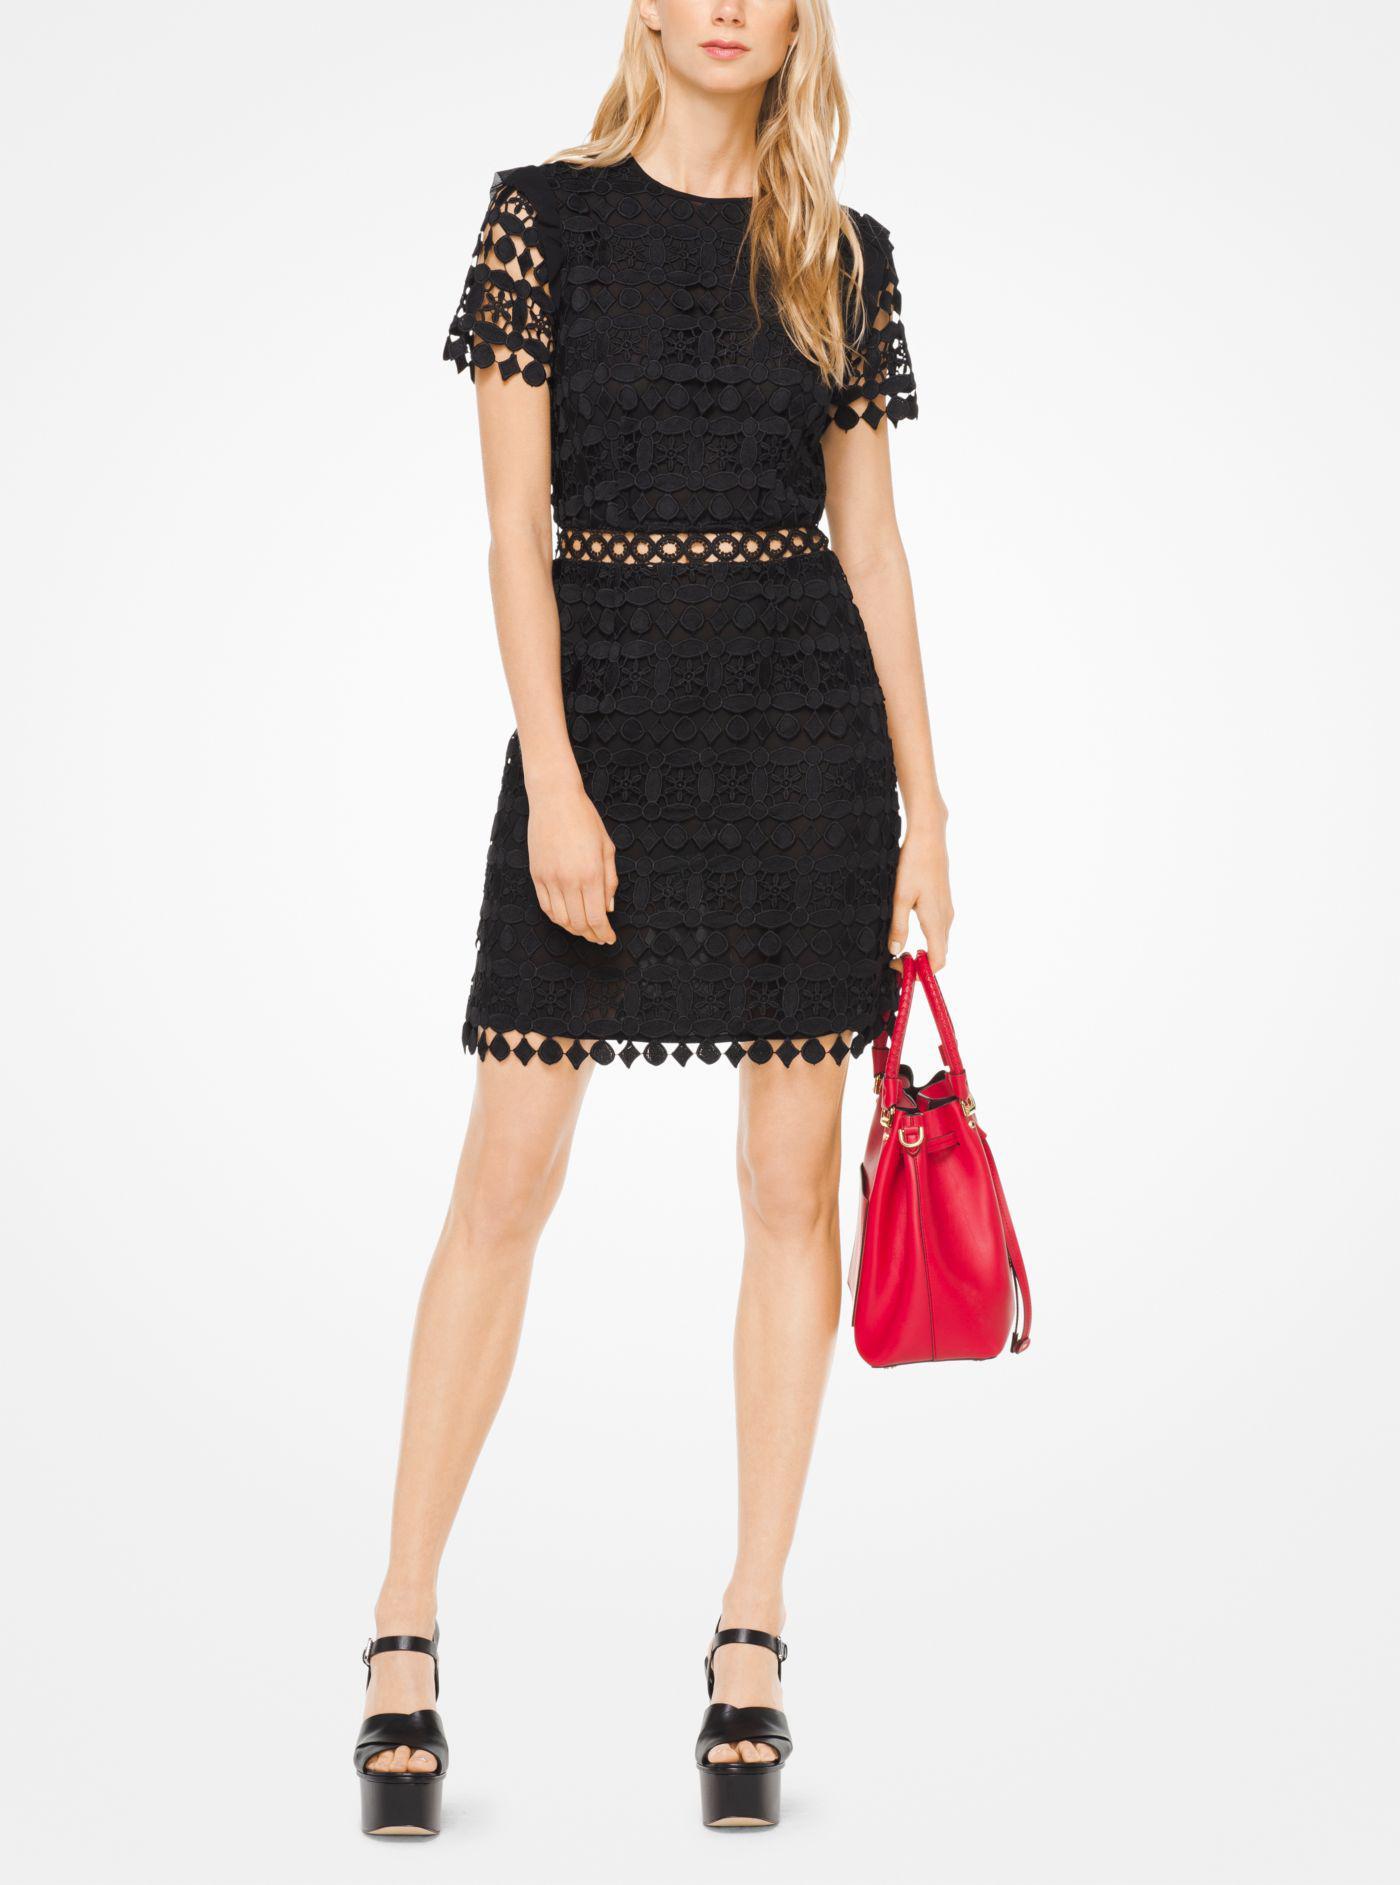 Lyst - Michael Kors Geometric Floral Lace Dress in Black 9f586181c6